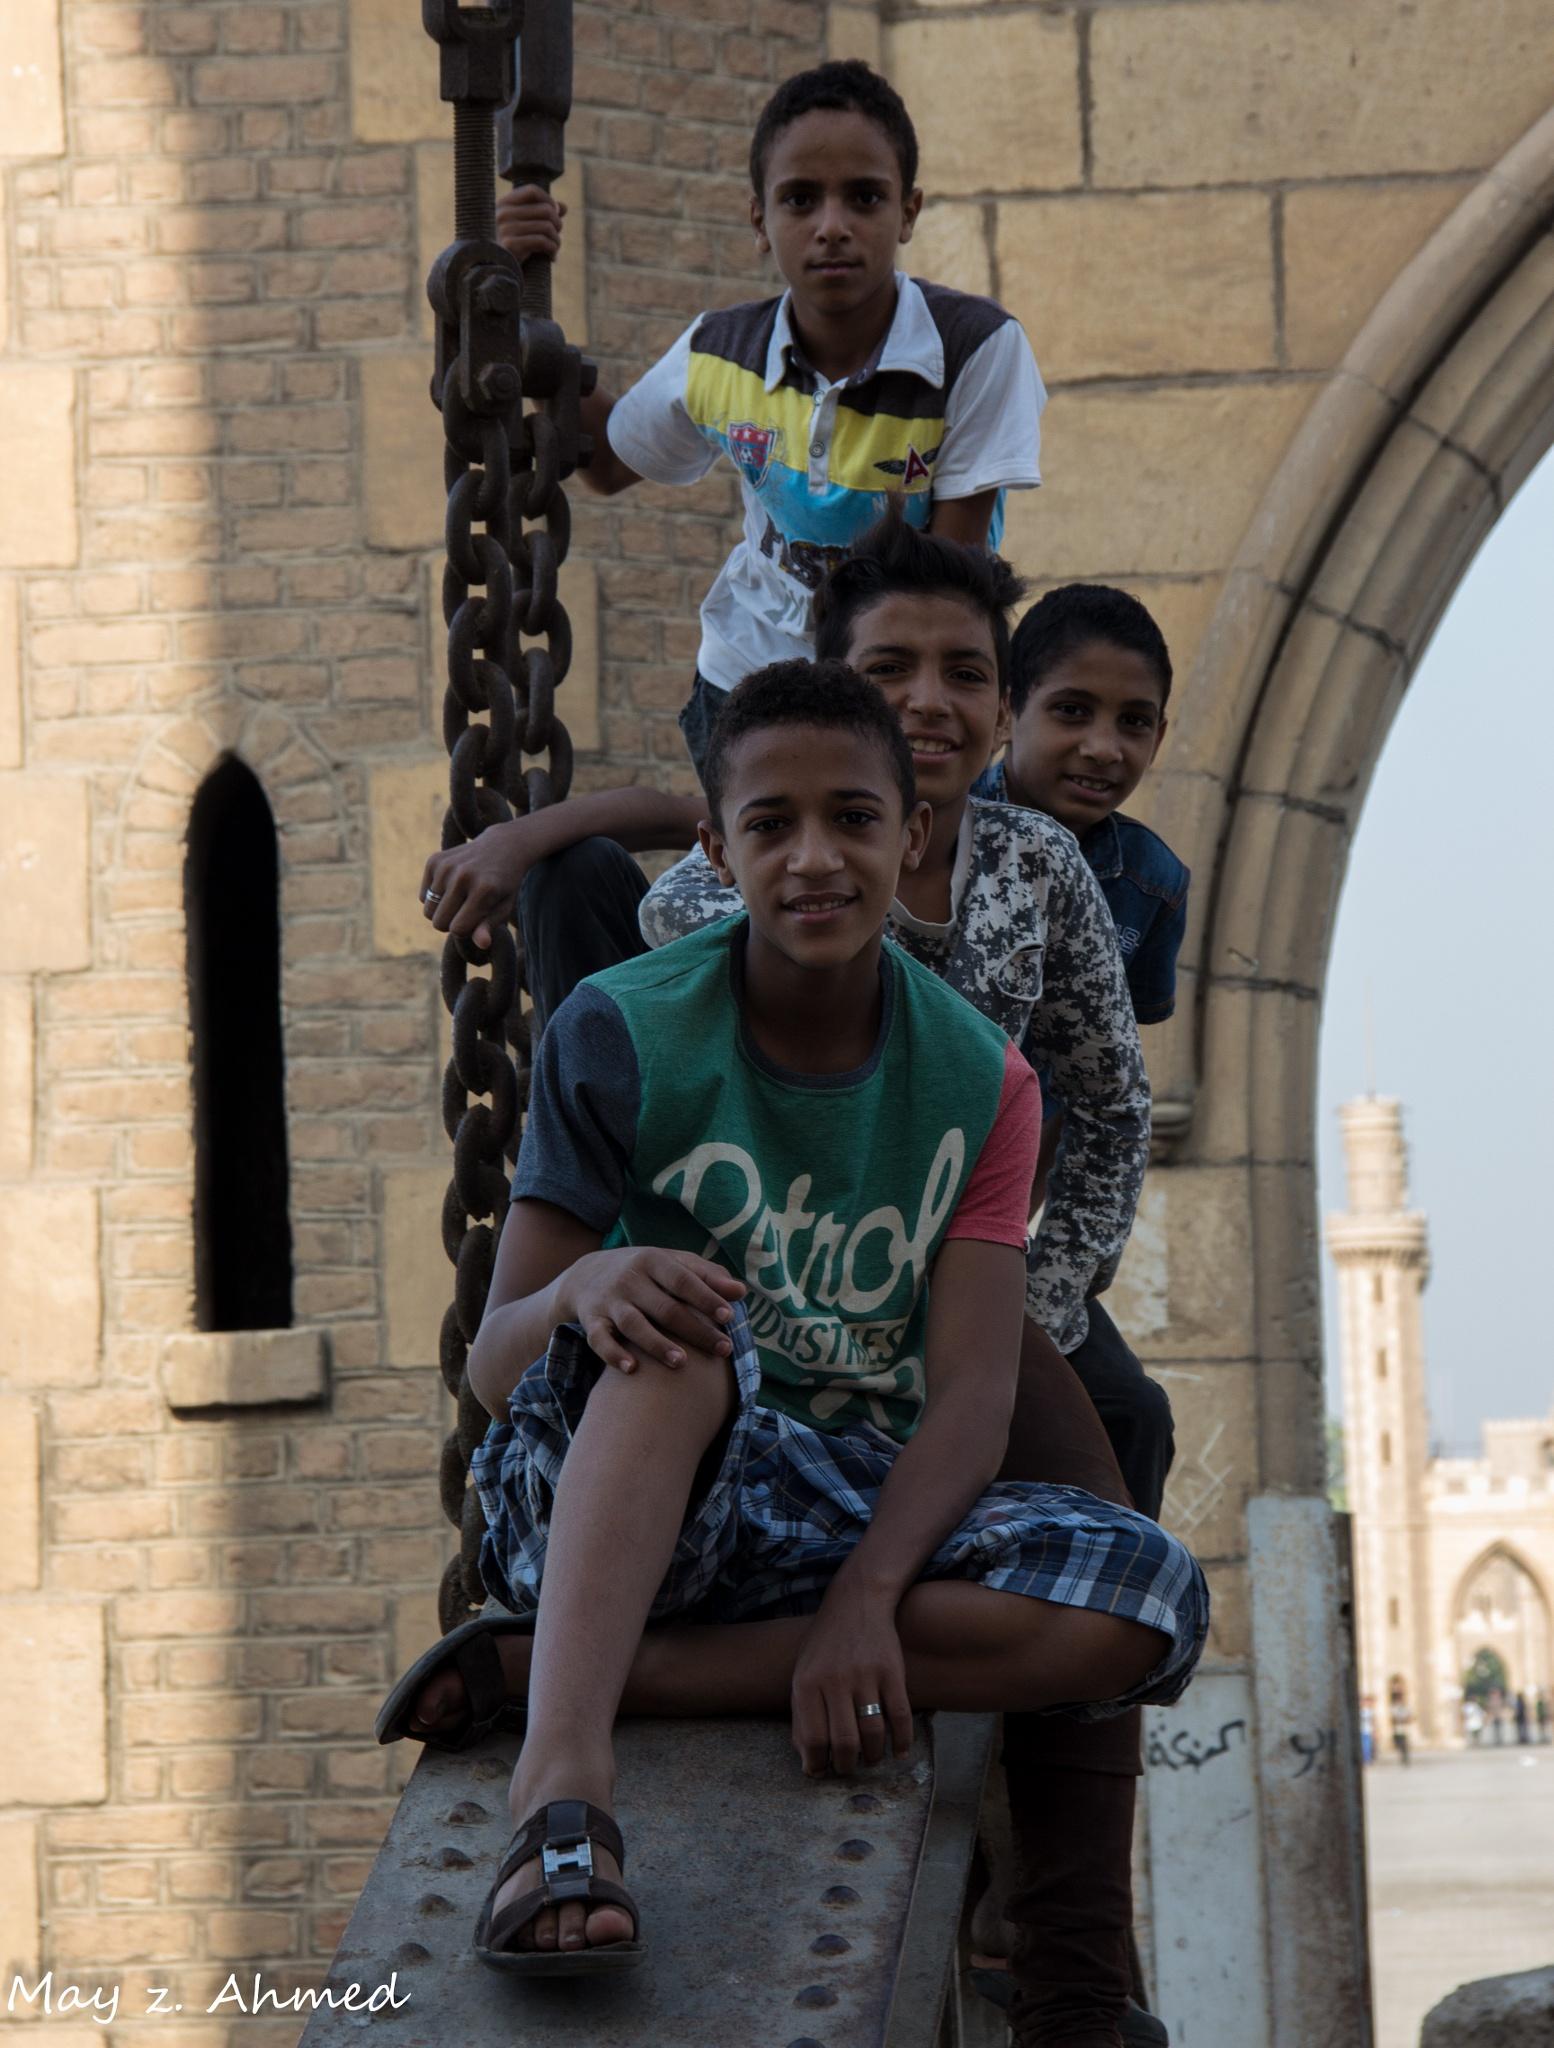 boys by May z. ahmed